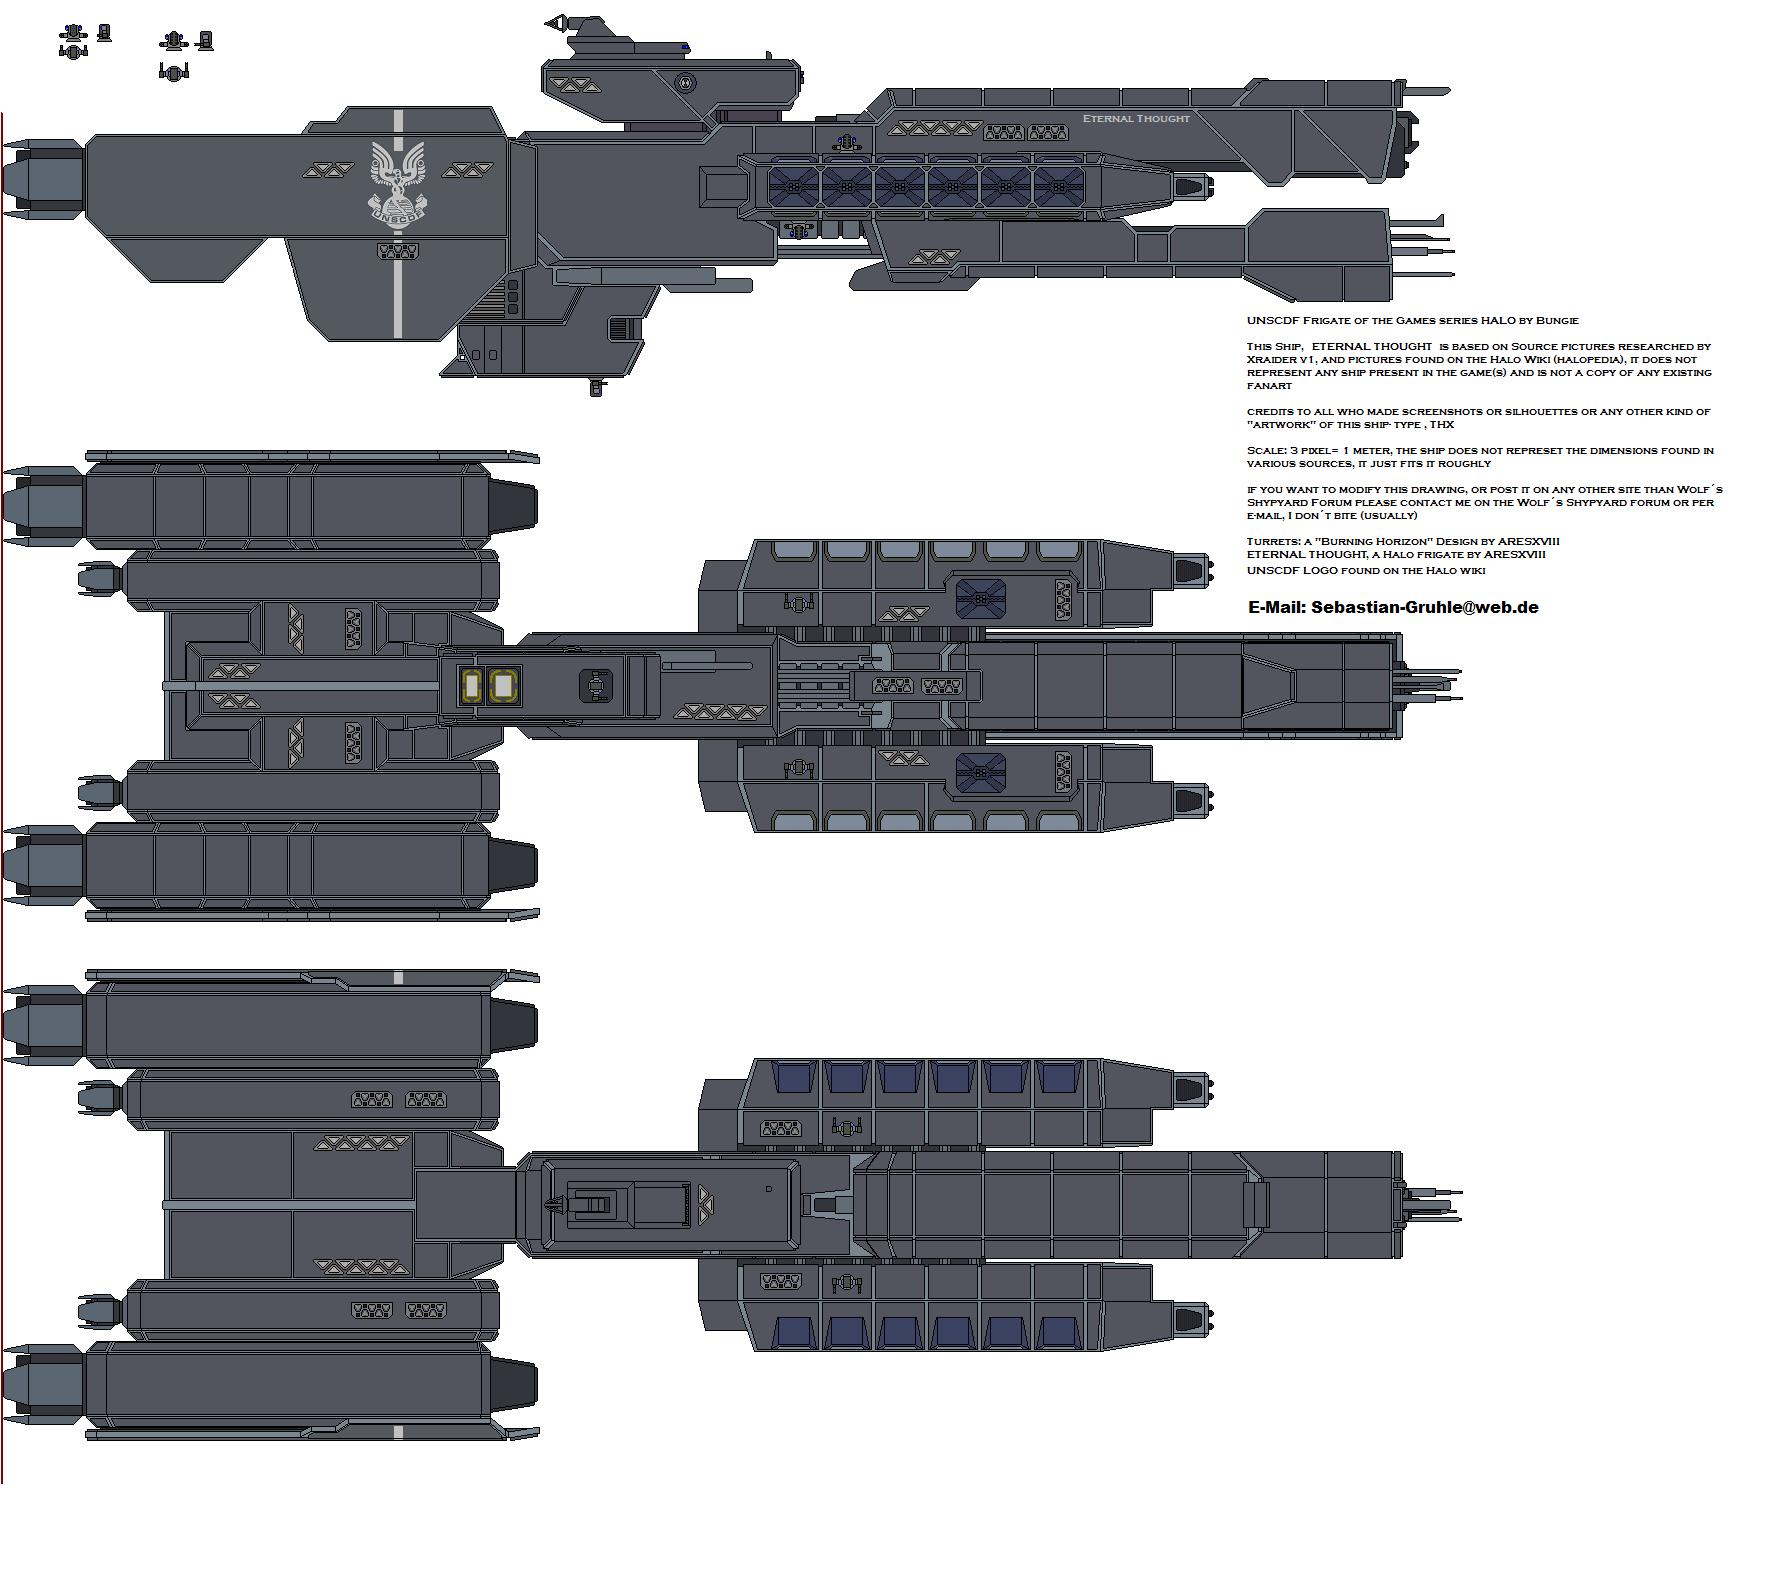 Eternal Thought Halo UNSC Frigate by AresXVIII on DeviantArt